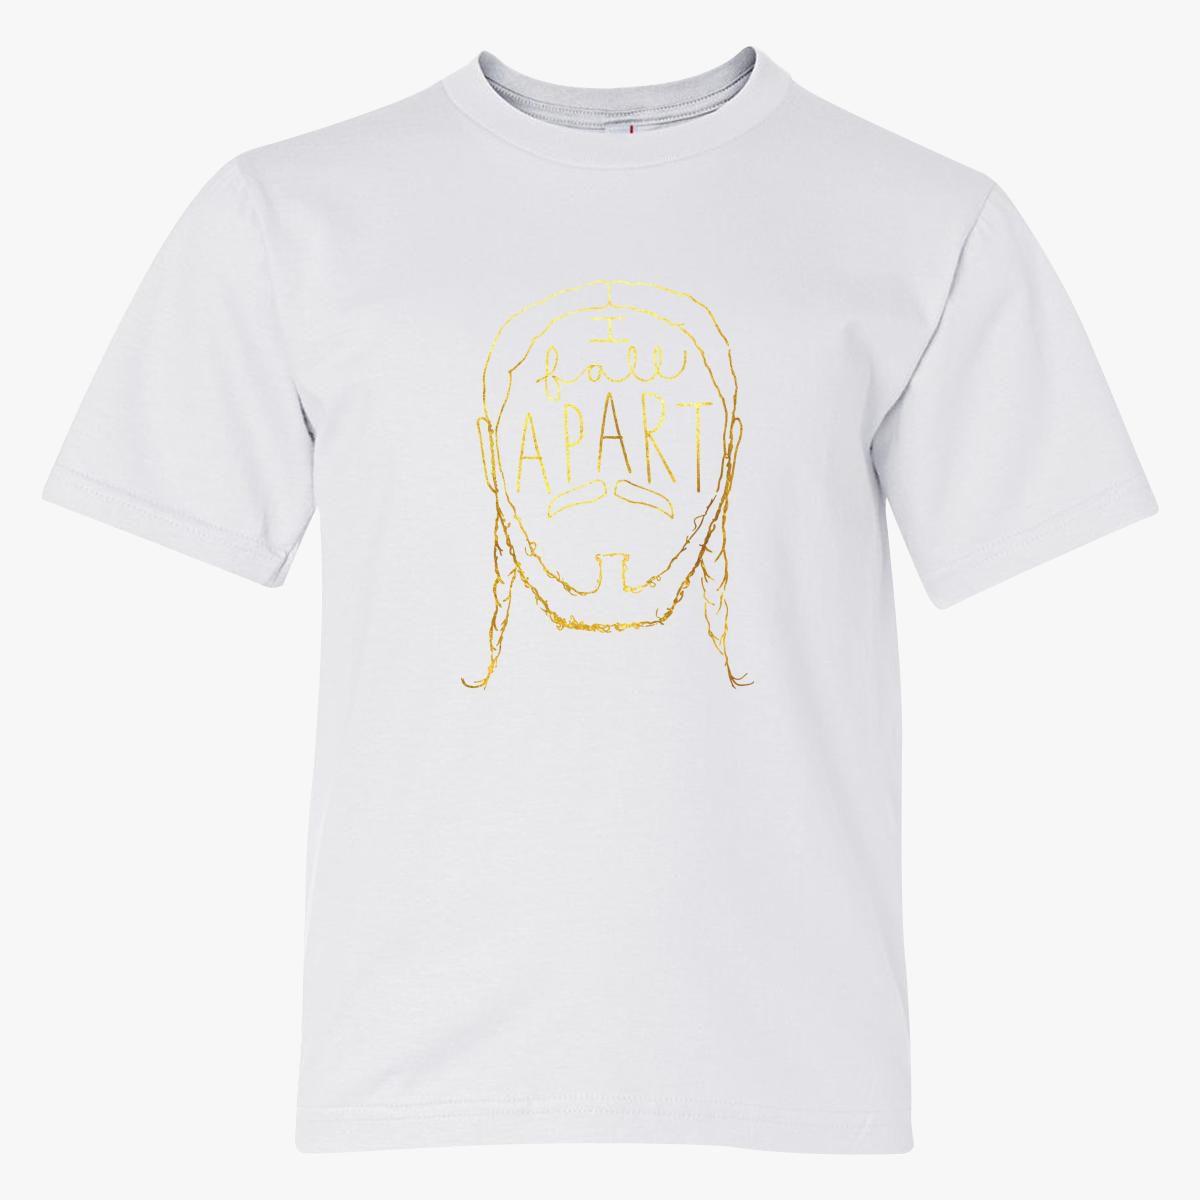 Post Malone I Fall Apart Guitar: Post Malone I Fall Apart Youth T-shirt